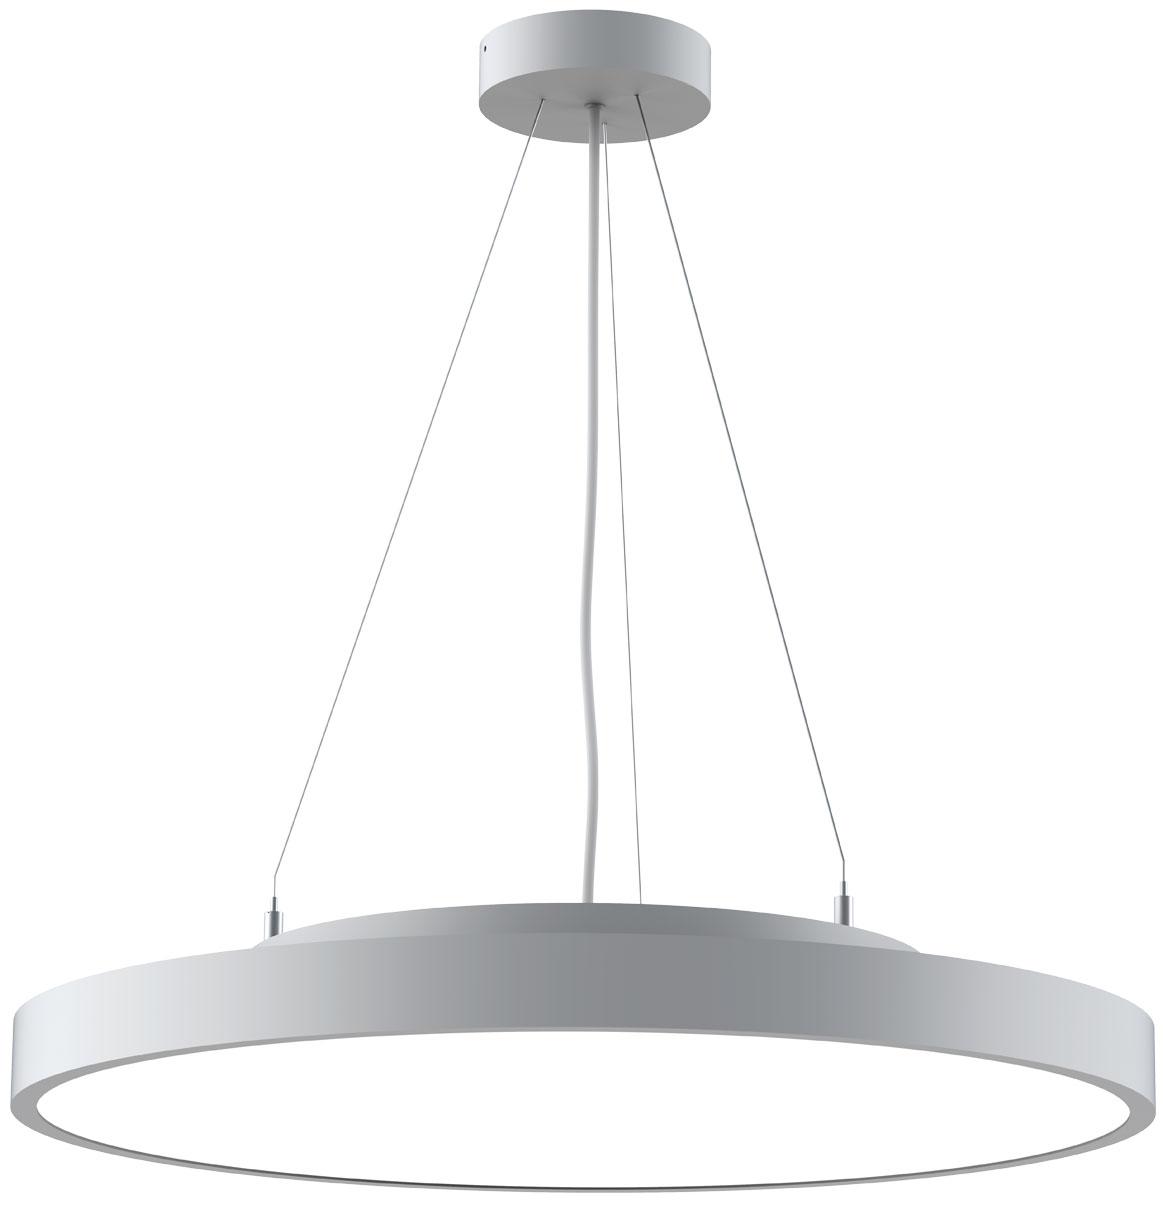 LEDAXO LED-Pendelleuchte PL-14 silber mit Seilabhängung